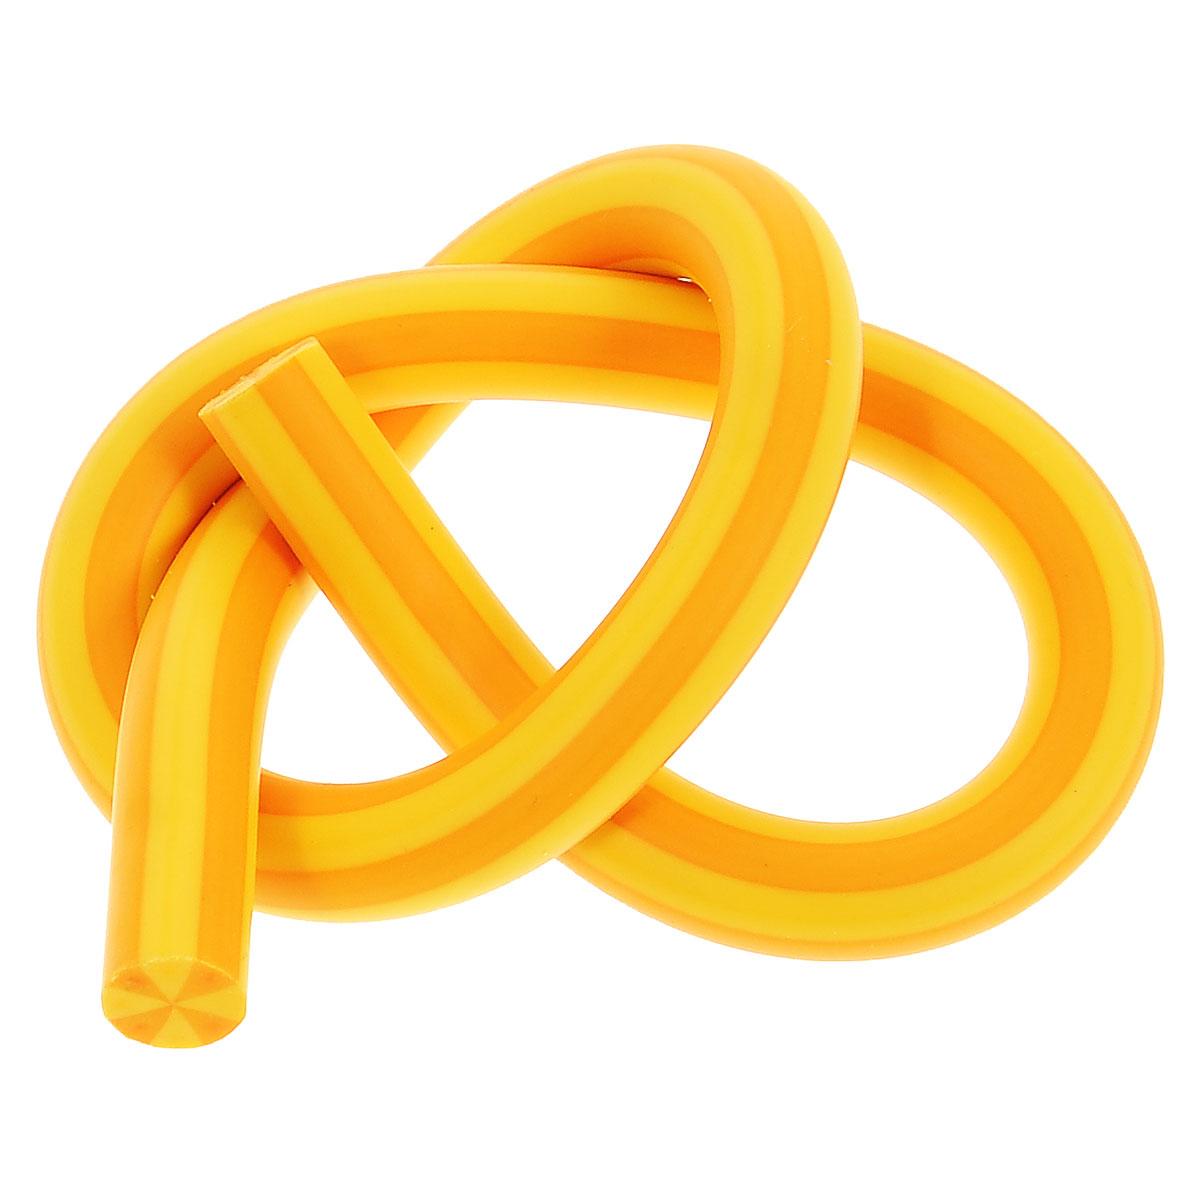 Brunnen Ластик гнущийся, цвет: желтый